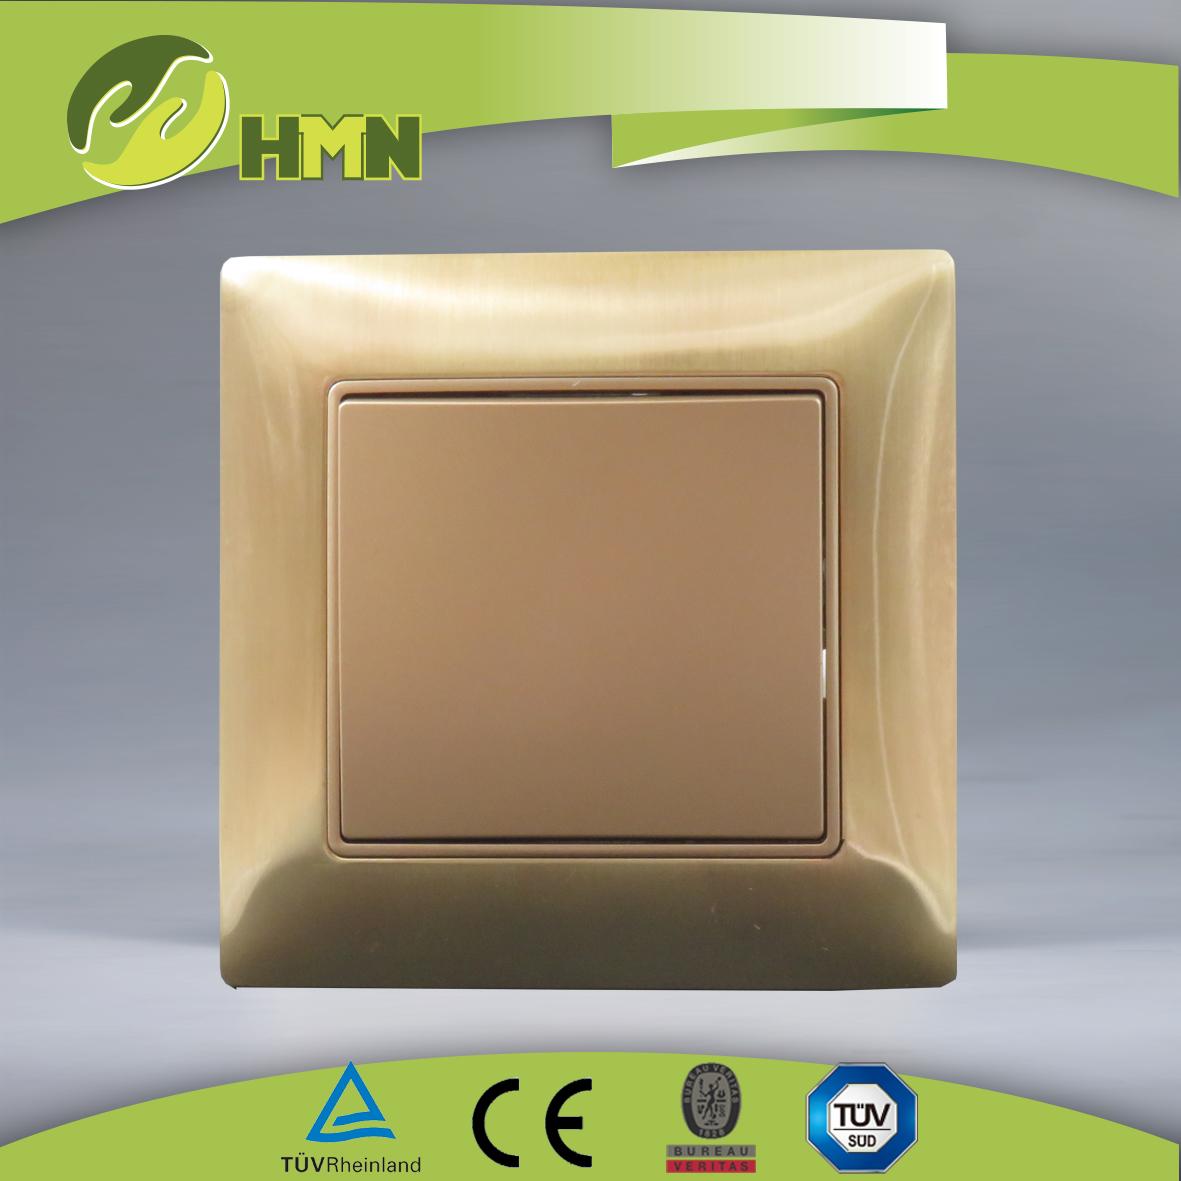 VZ111/VZ112 Metal Zinc 1gang 1way/2way switch